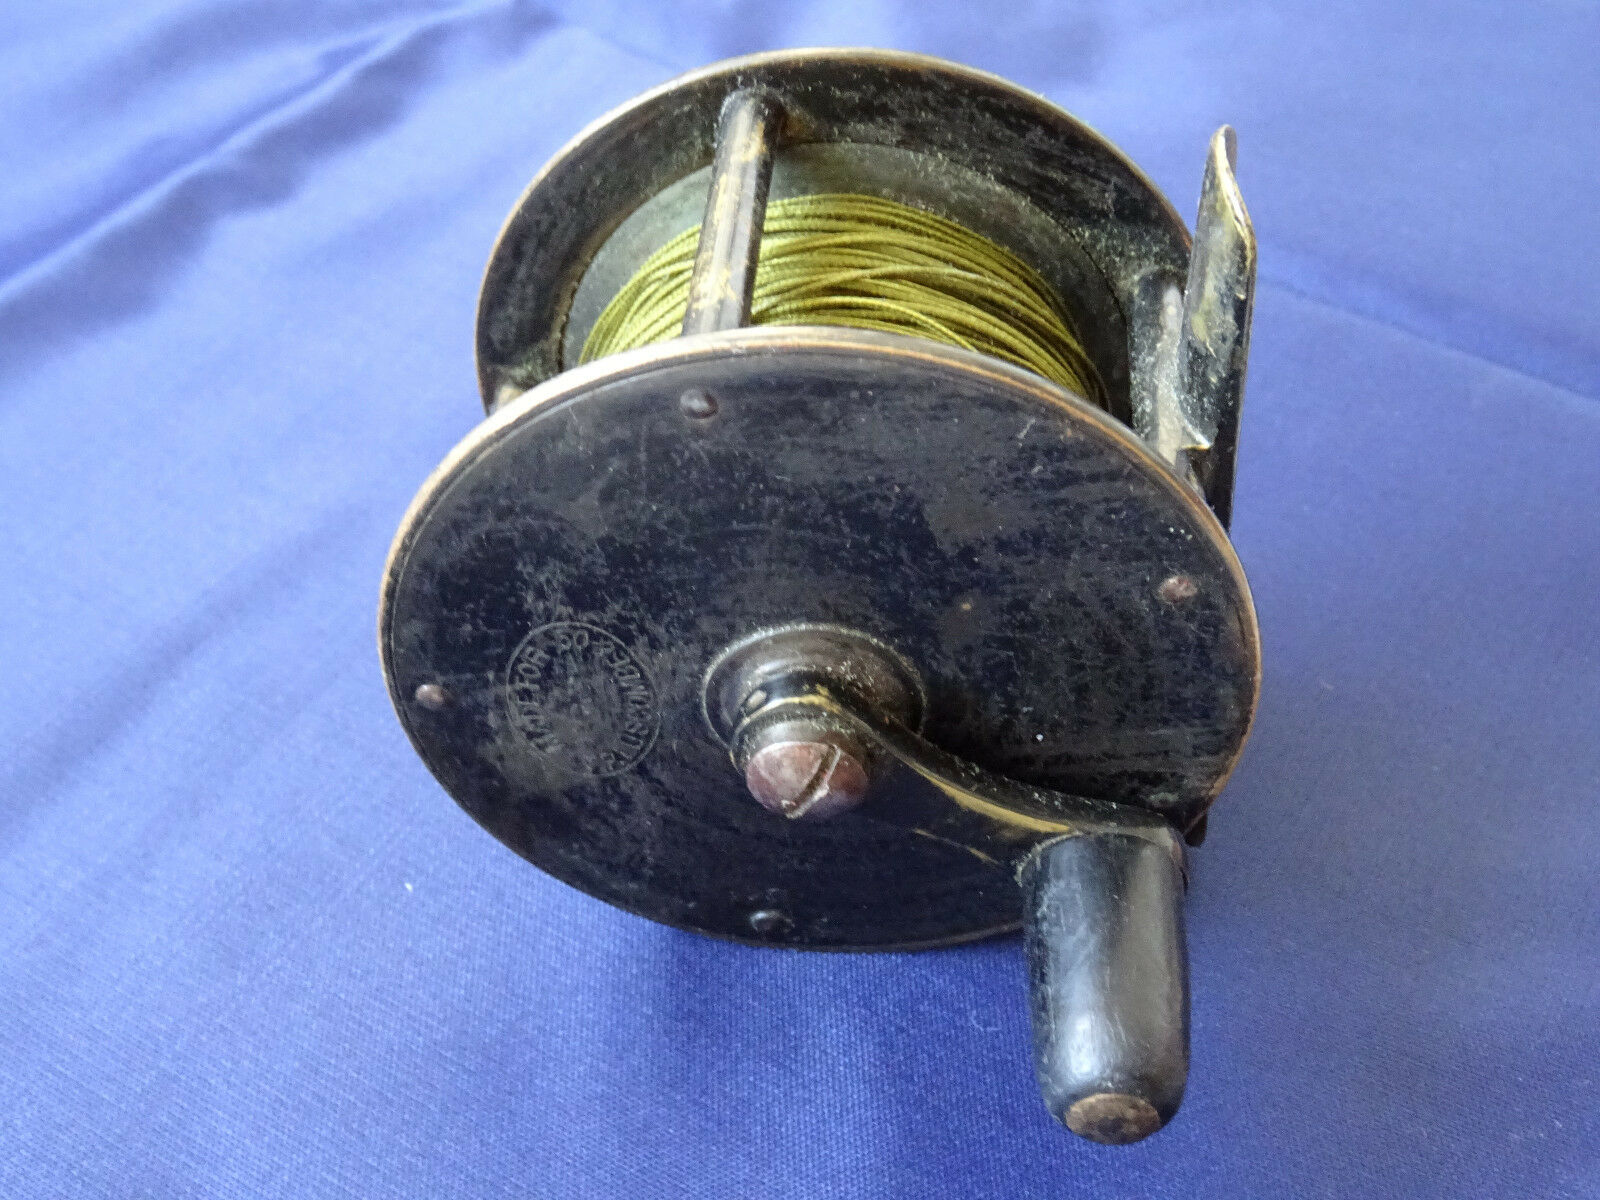 Un raro vintage T P LUSCOMBE & Co 2 12 ampio tamburo in ottone Manovella Vento Fly Reel